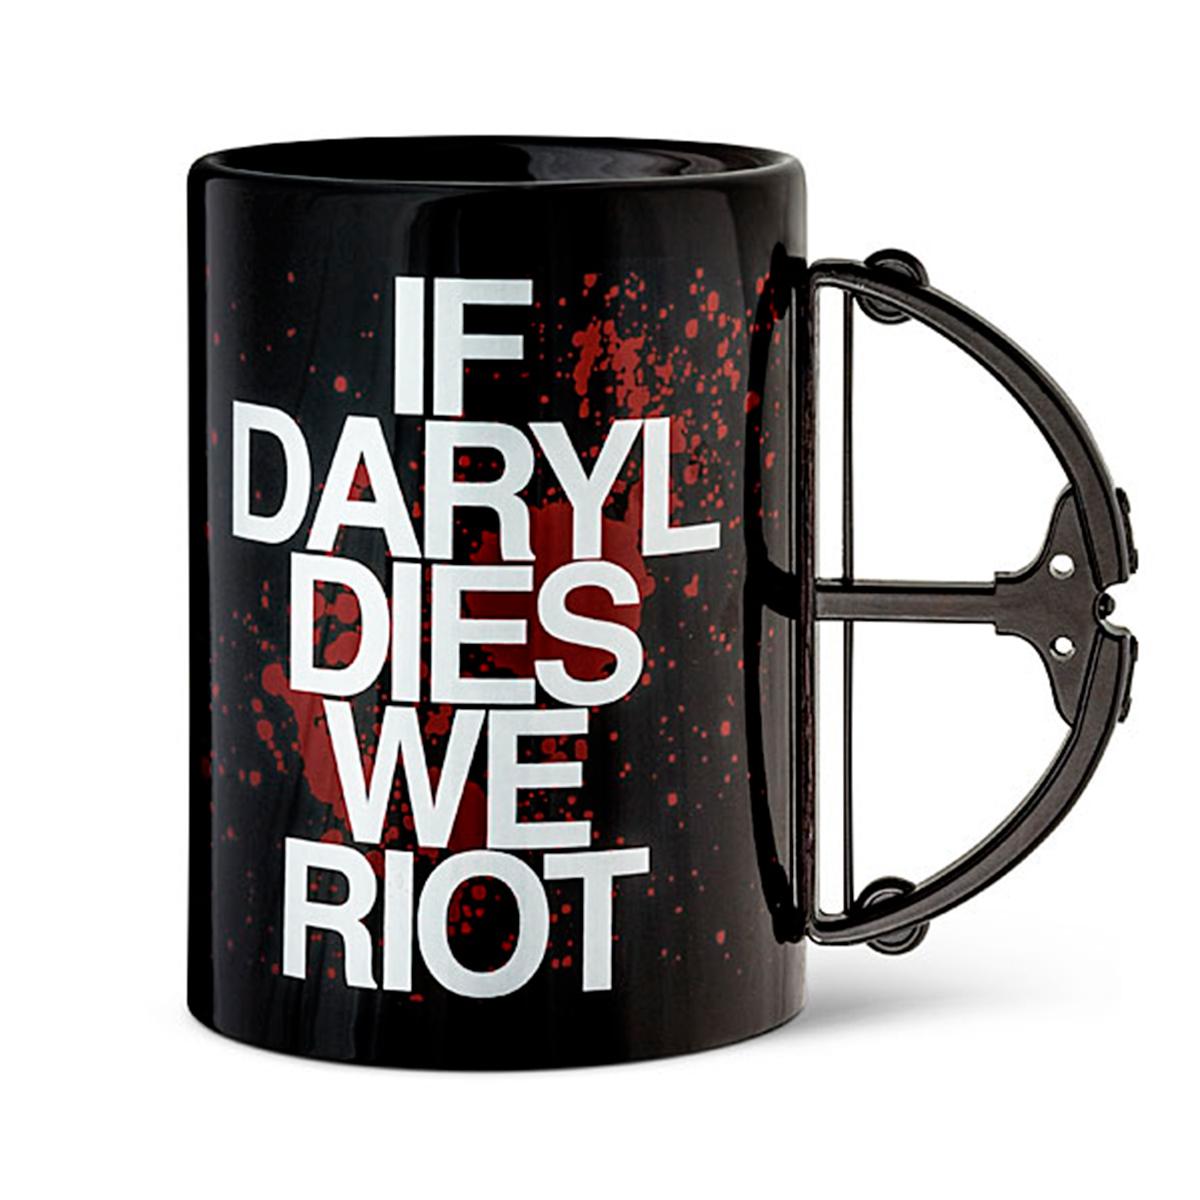 5c2ce14db4 NerdMania - Marcas / The Walking Dead / The Walking Dead - Caneca - Daryl  Dixon - THE WALKING DEAD